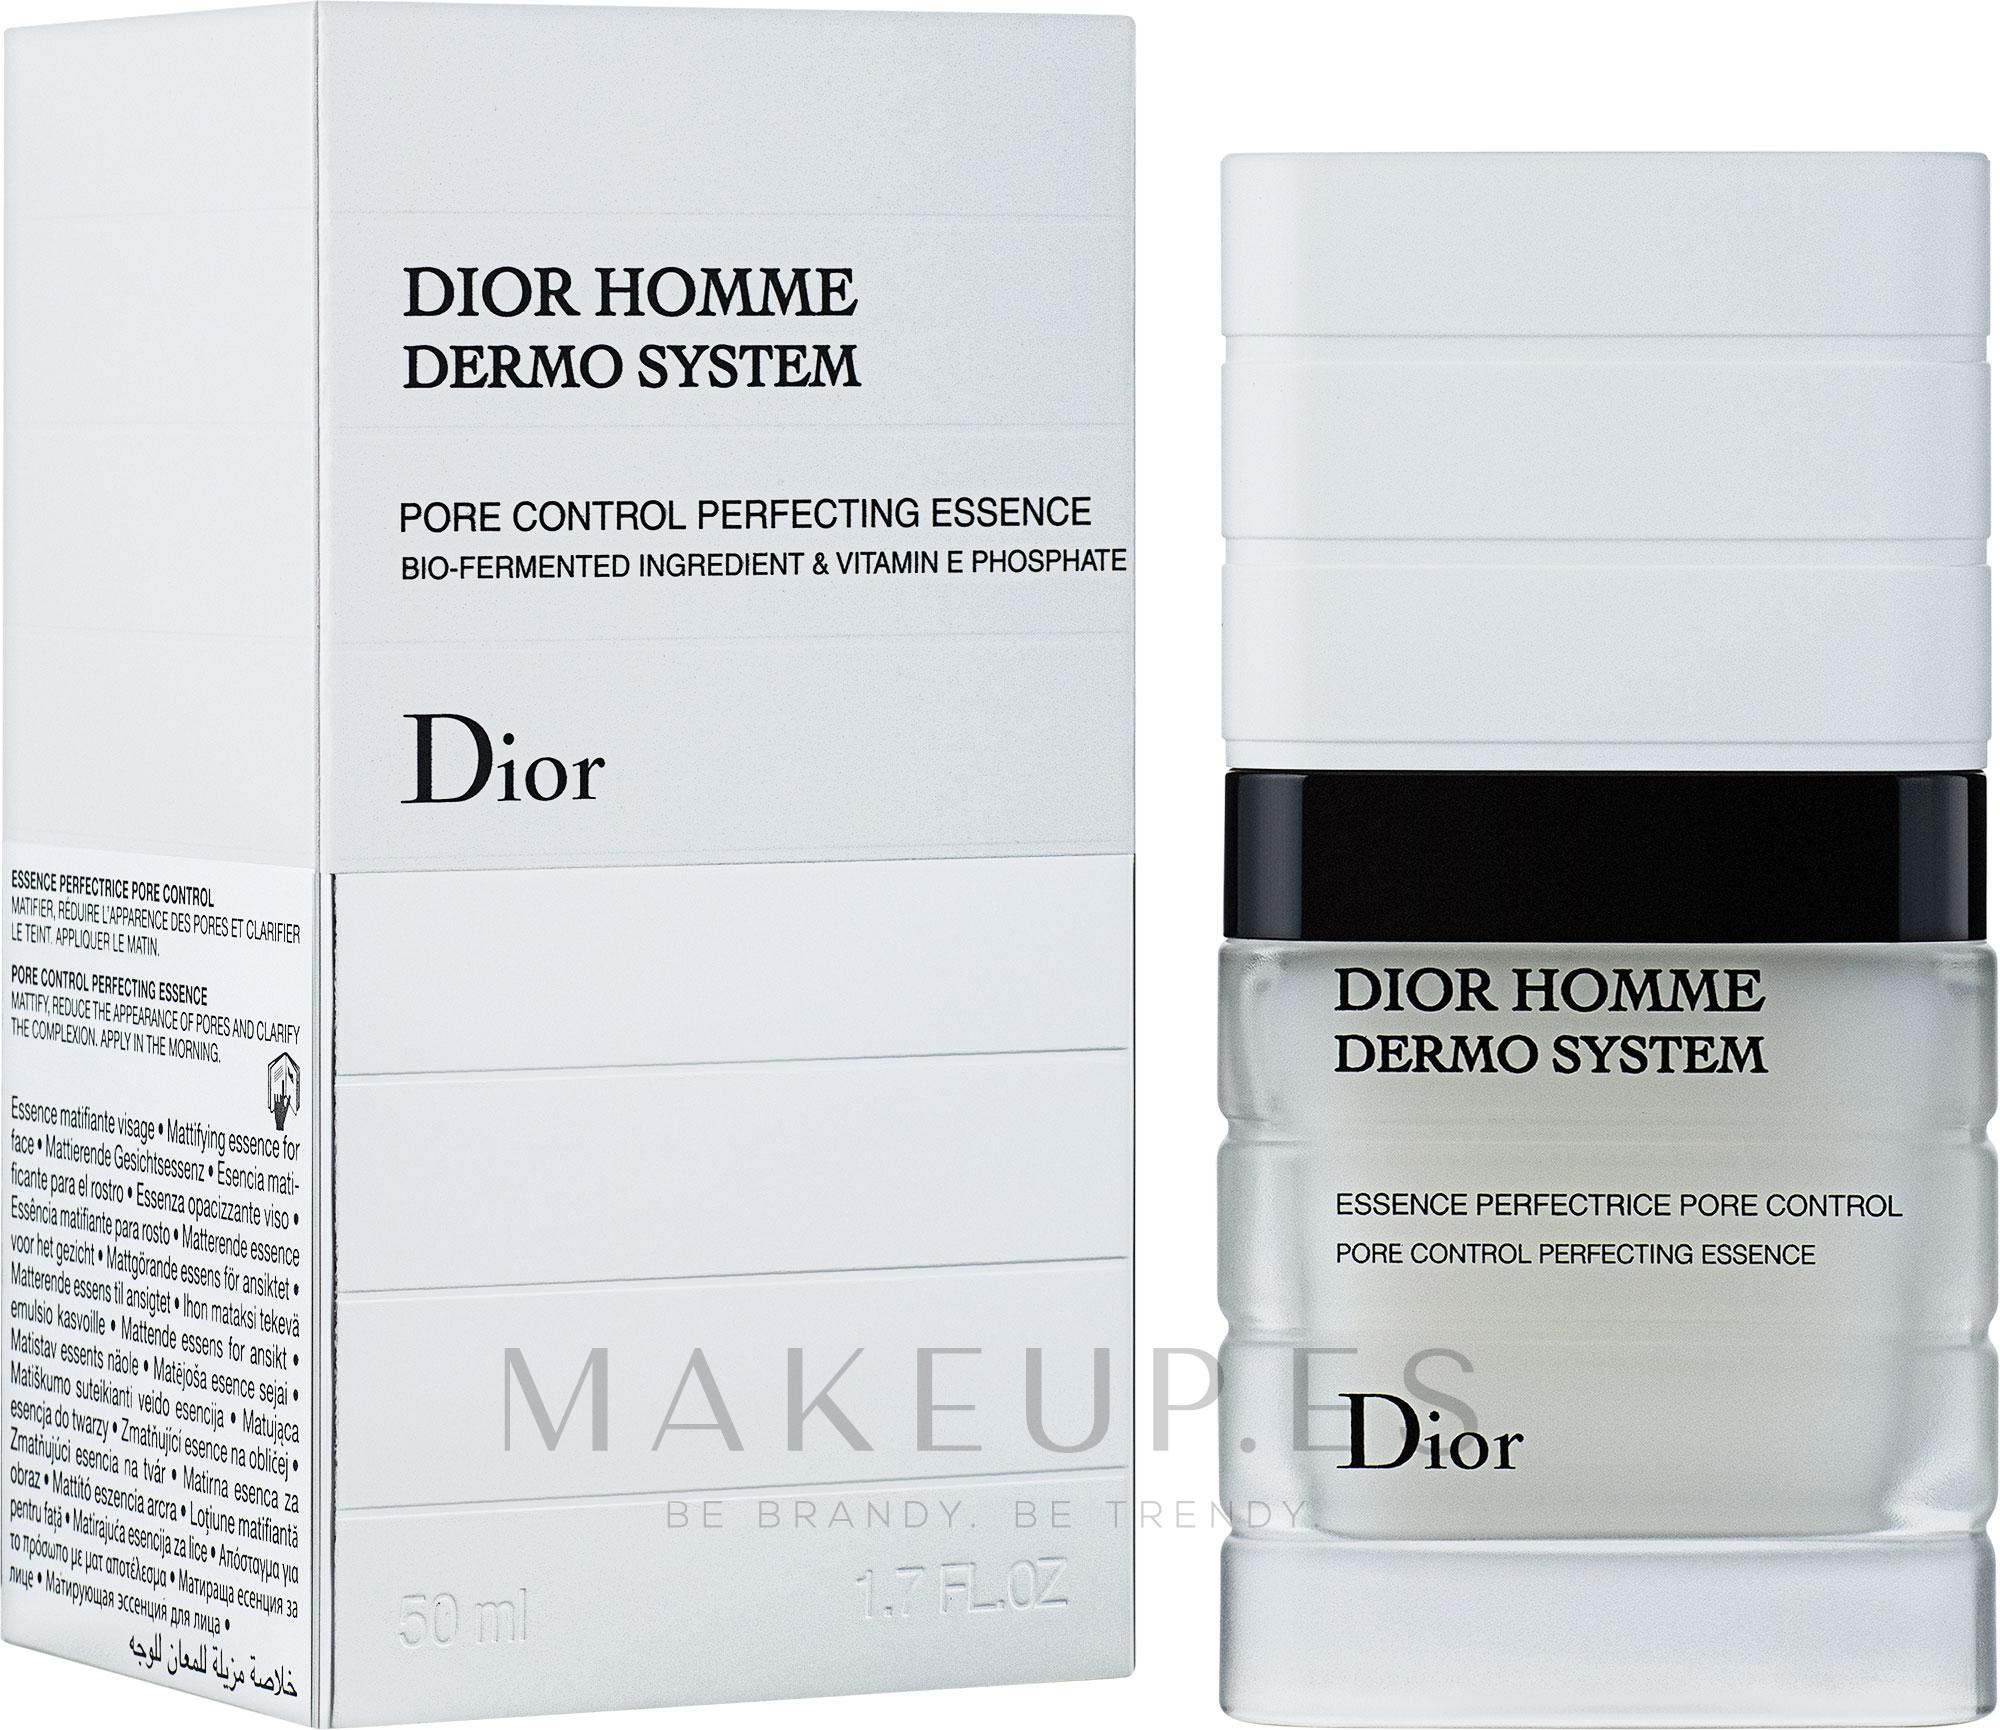 Emulsión facial vigorizante con ingredientes biofermentados y fosfato de vitamina E - Dior Homme Dermo System Emulsion  — imagen 50 ml